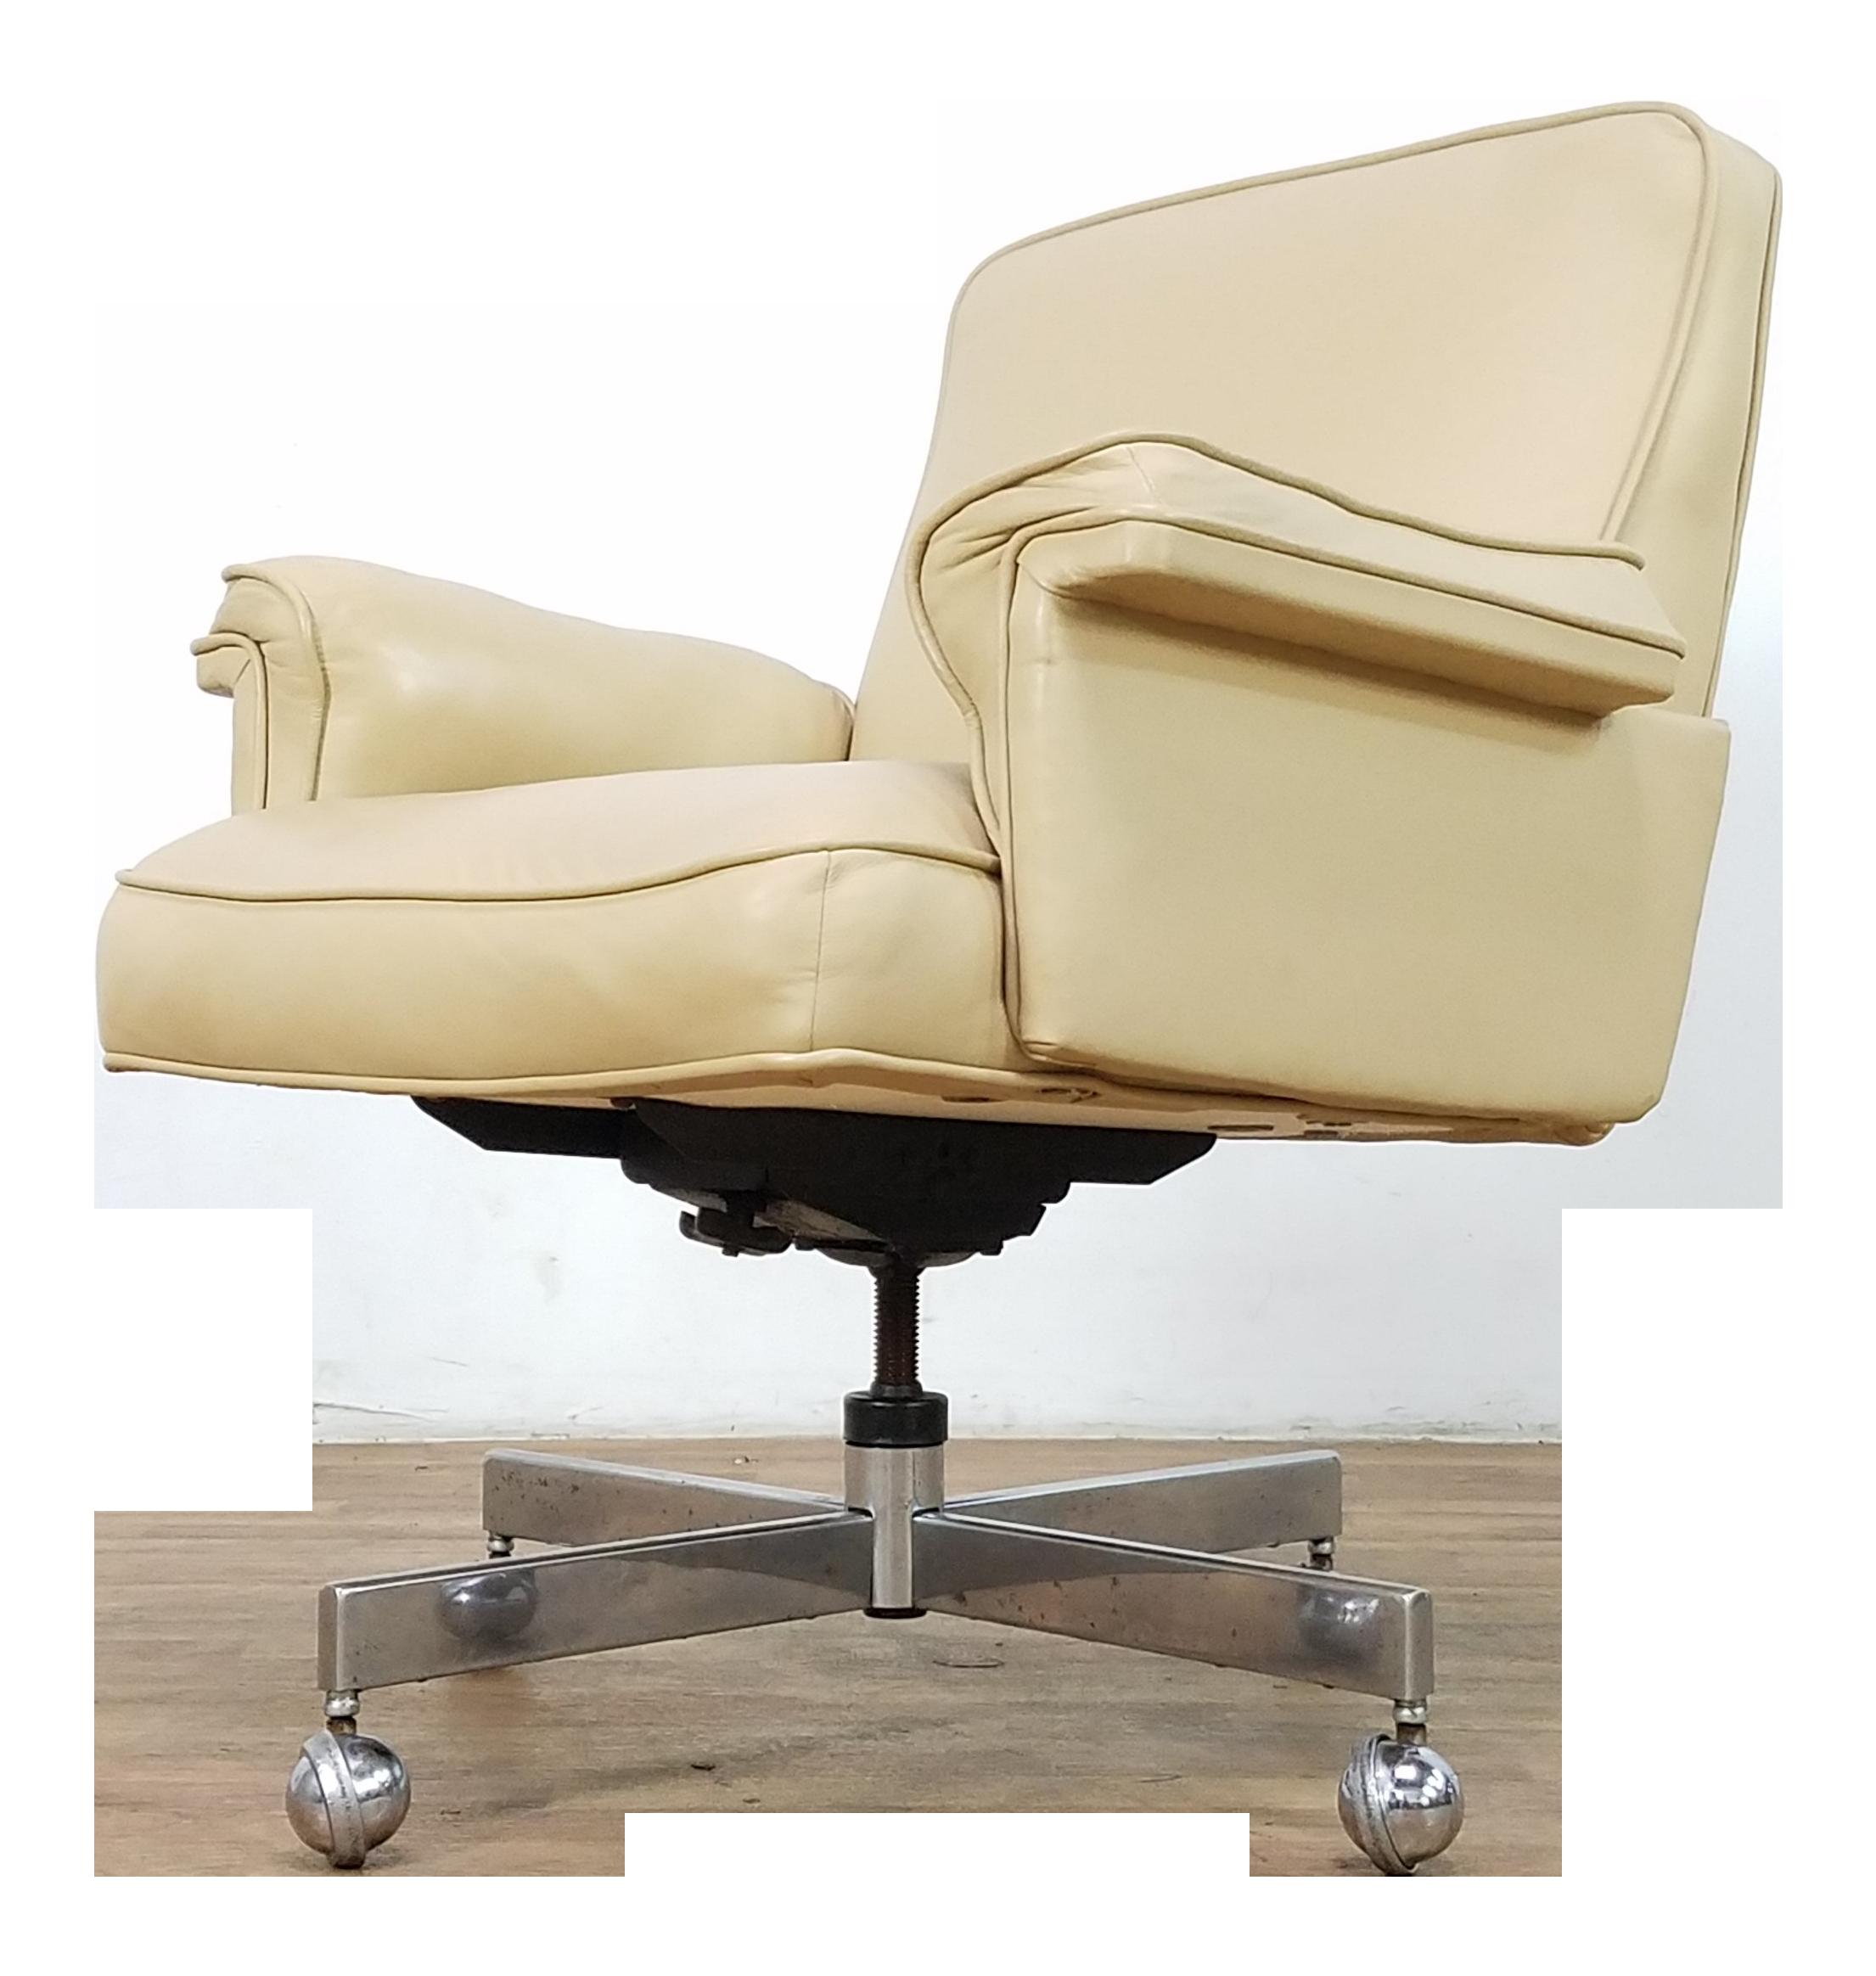 Enjoyable Mid Century Doerner Faultless Leather Office Chair Creativecarmelina Interior Chair Design Creativecarmelinacom